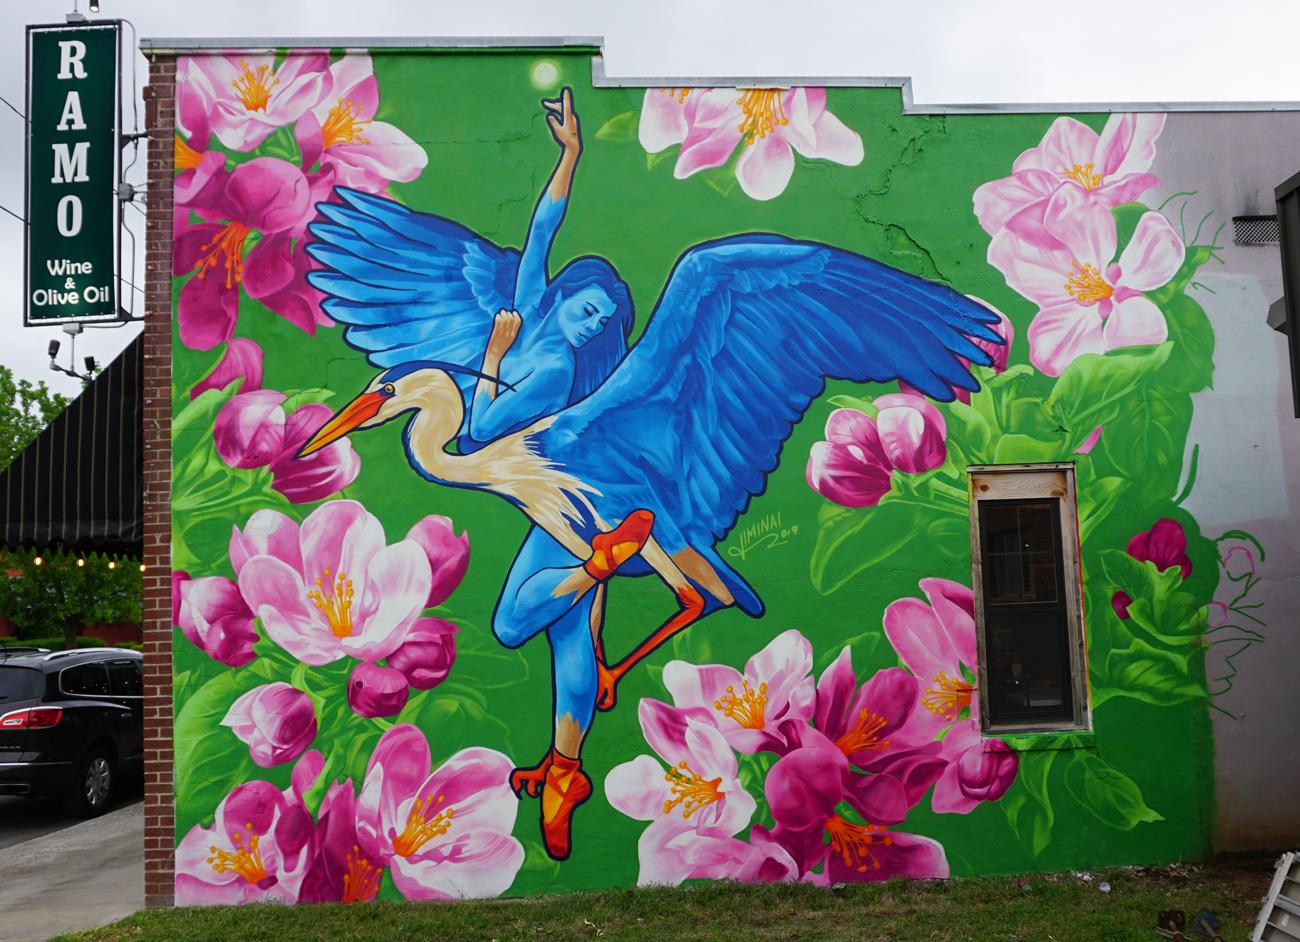 JIMINAI-Mural-GraceInBlue_Web.png